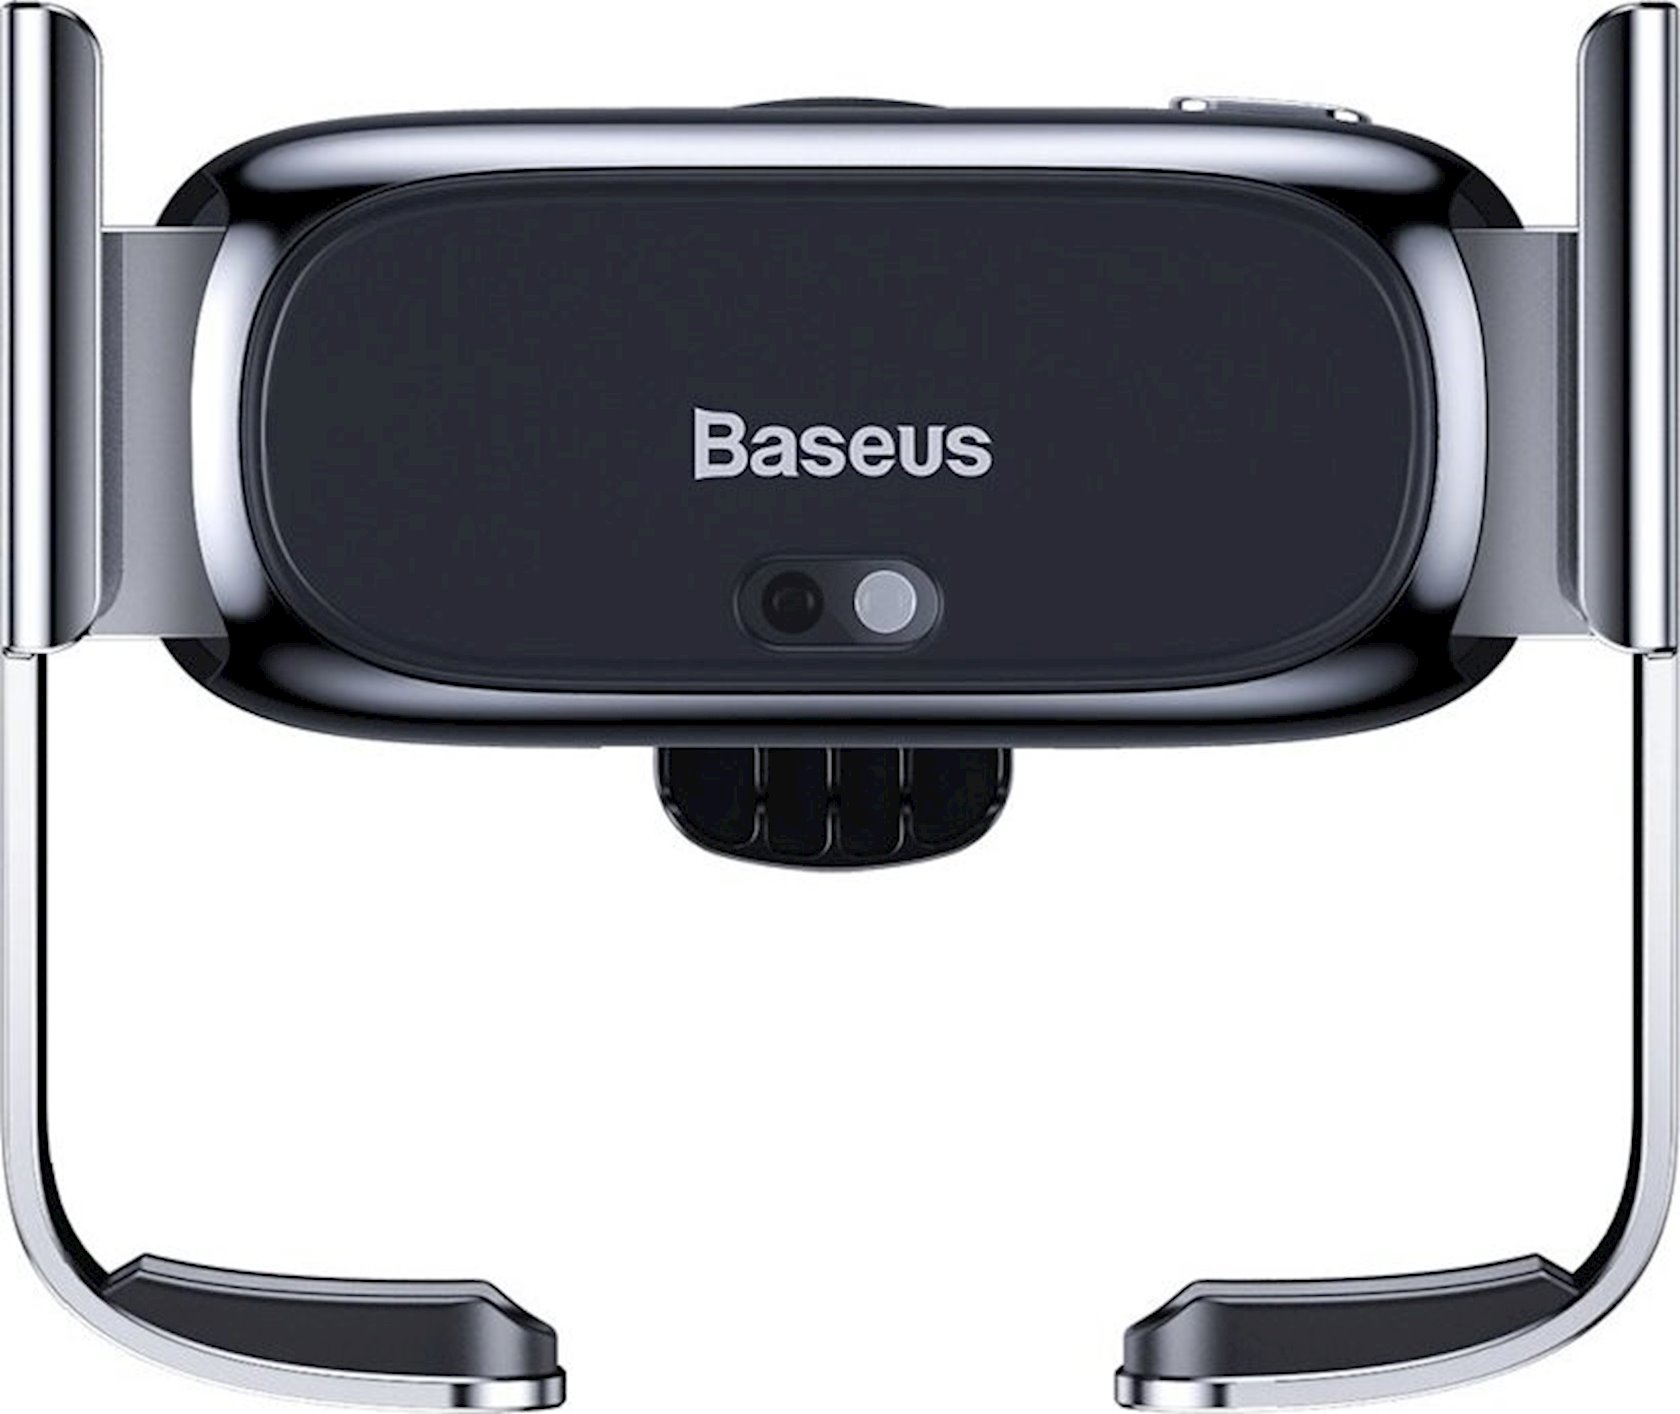 Avtomobil üçün telefon tutucusu Baseus Mini Electric Air Vent Car Holder, qara